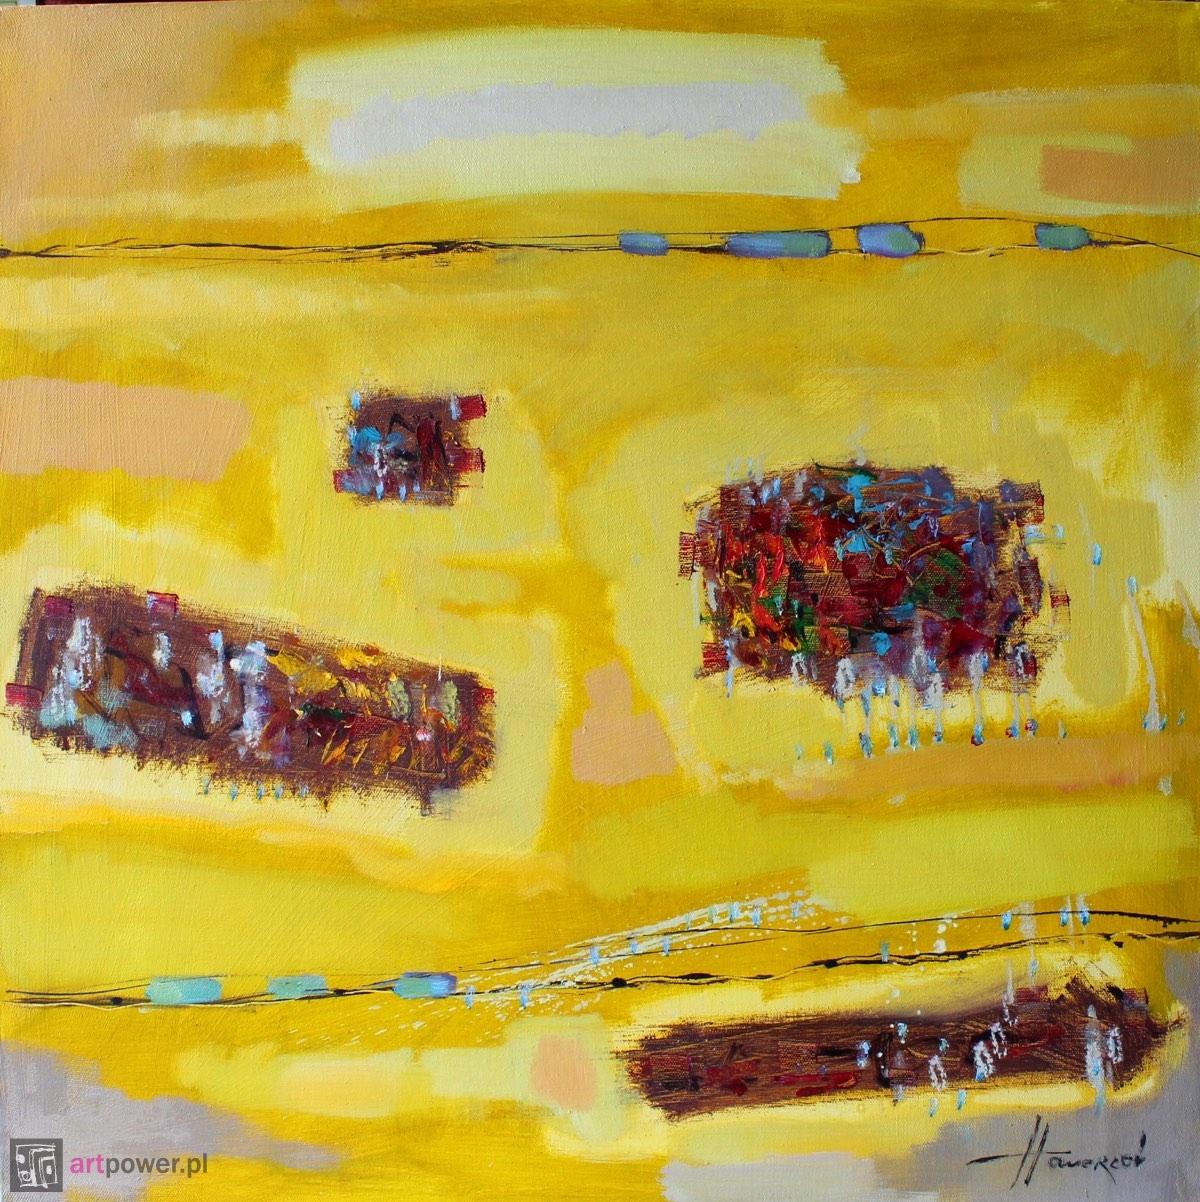 Żółta galaktyka